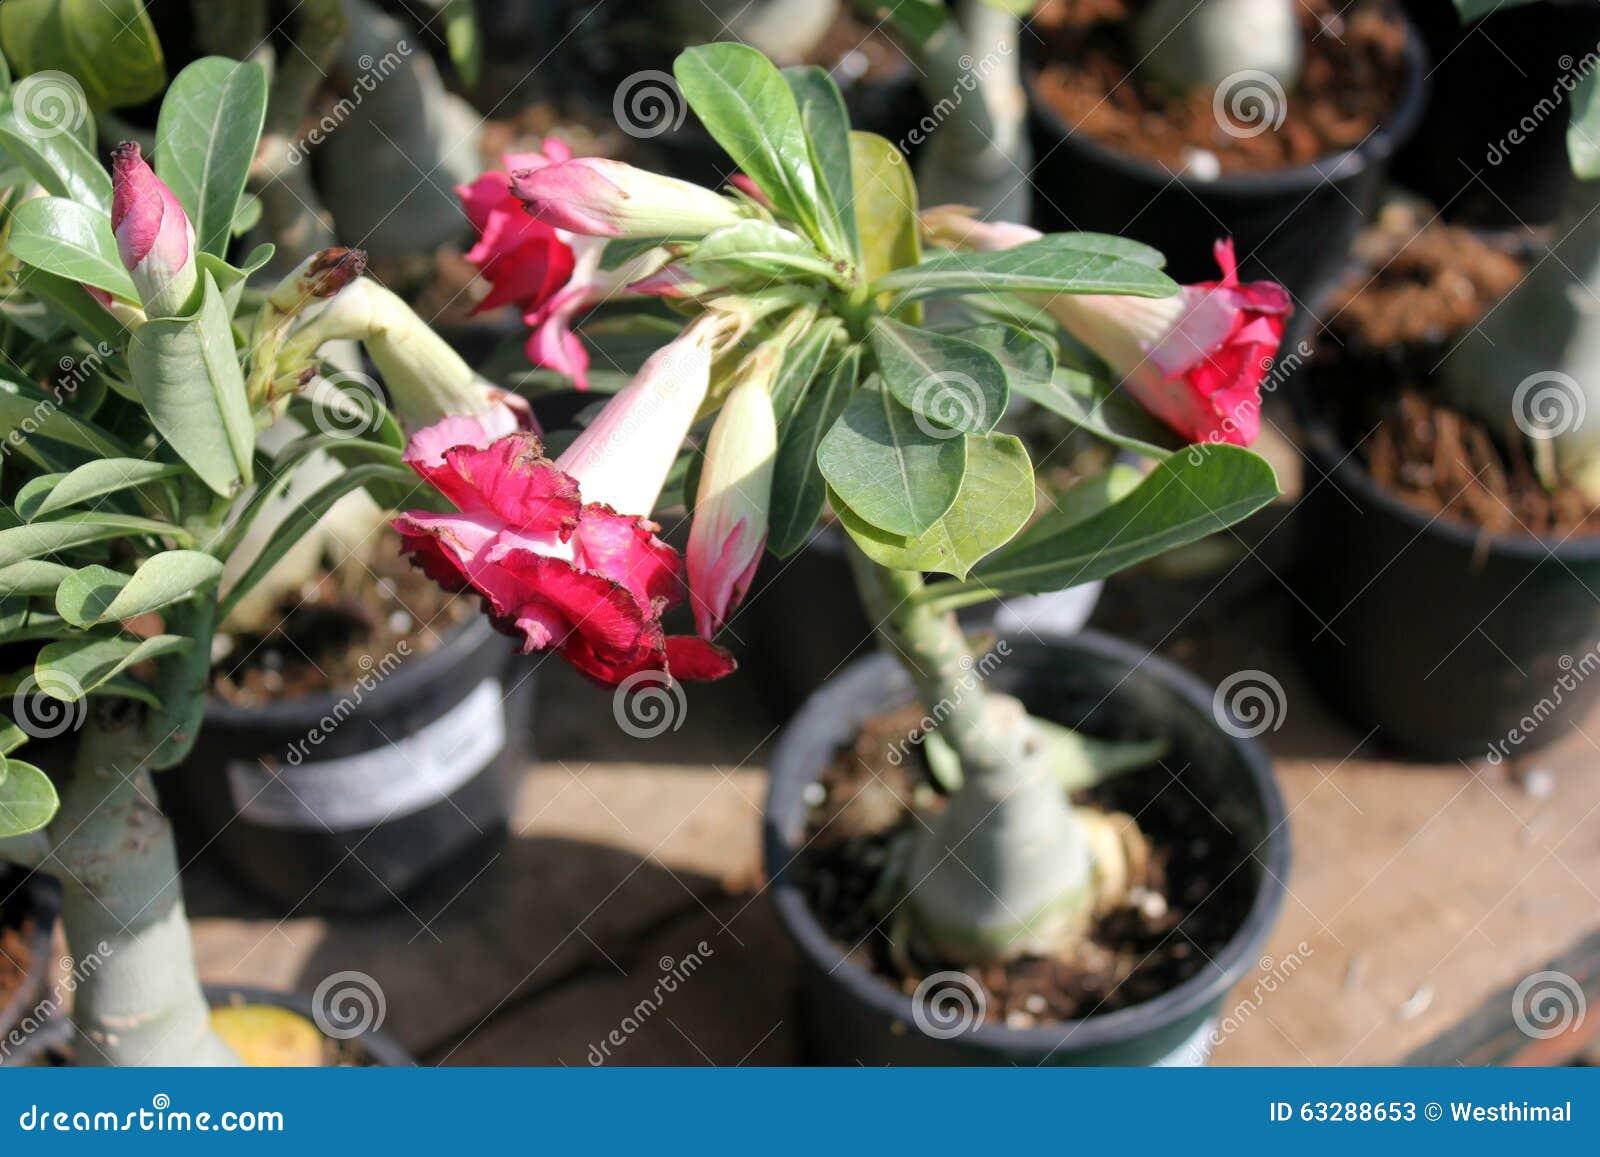 Adenium Obesum Desert Rose Stock Image Image Of Flowers Grown